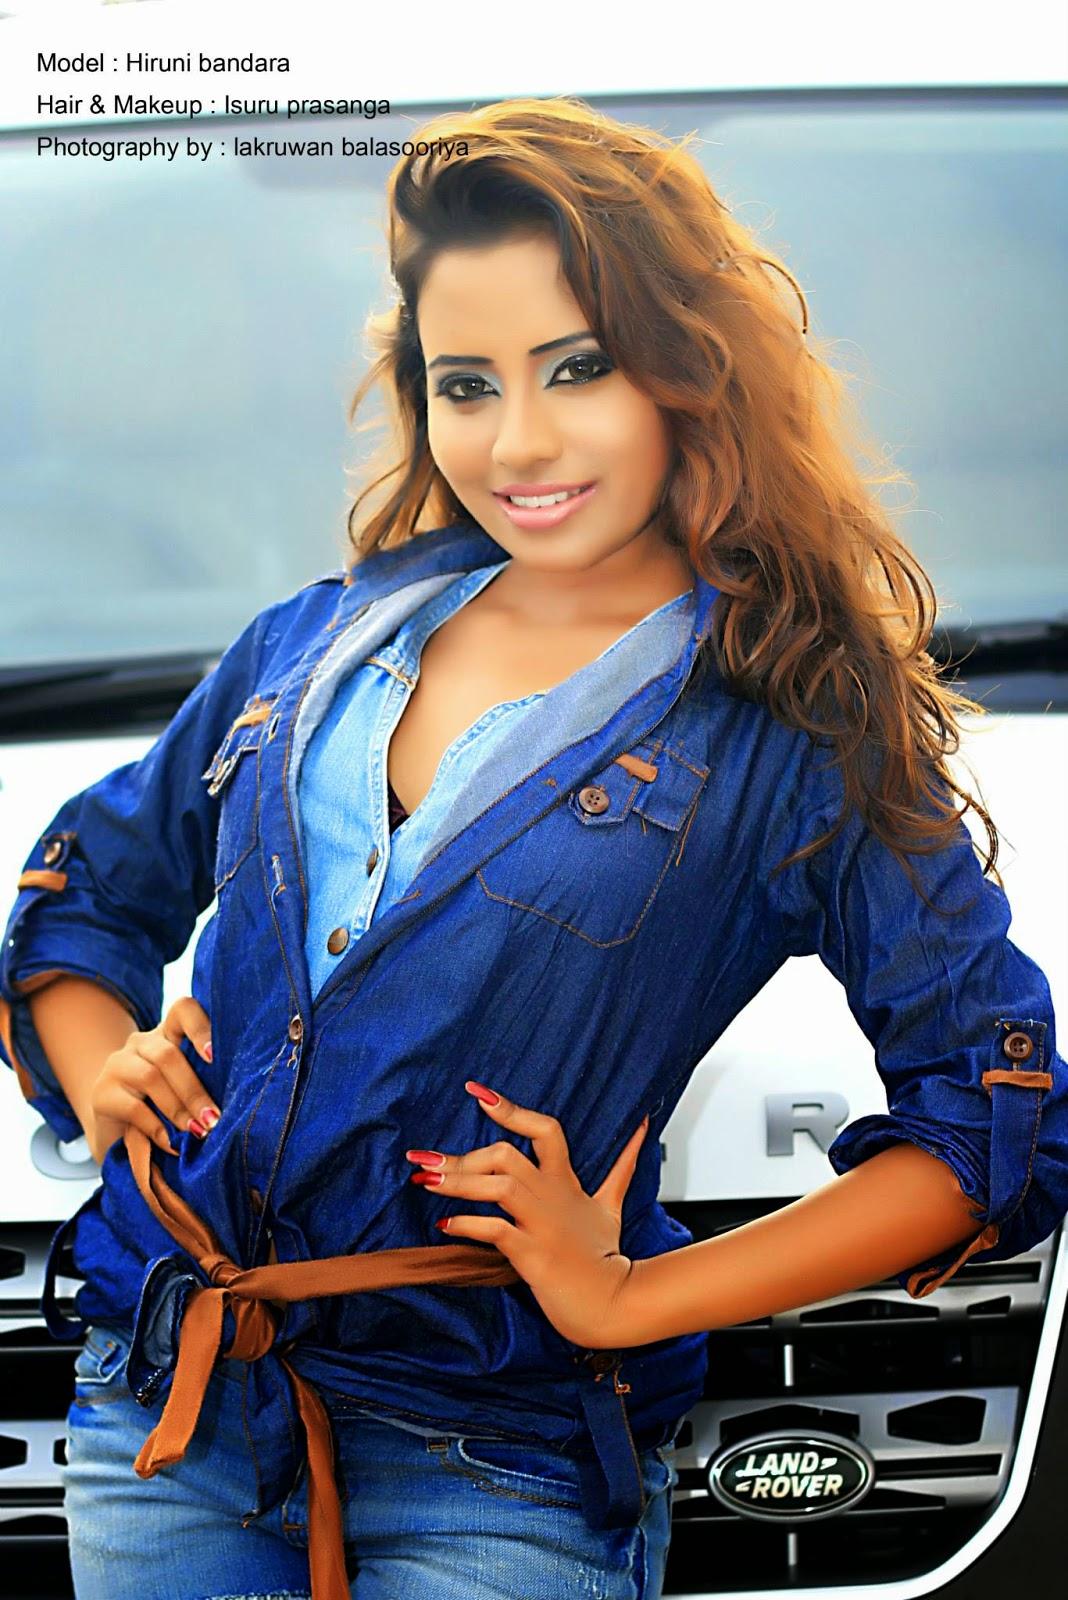 Hiruni Bandara blue